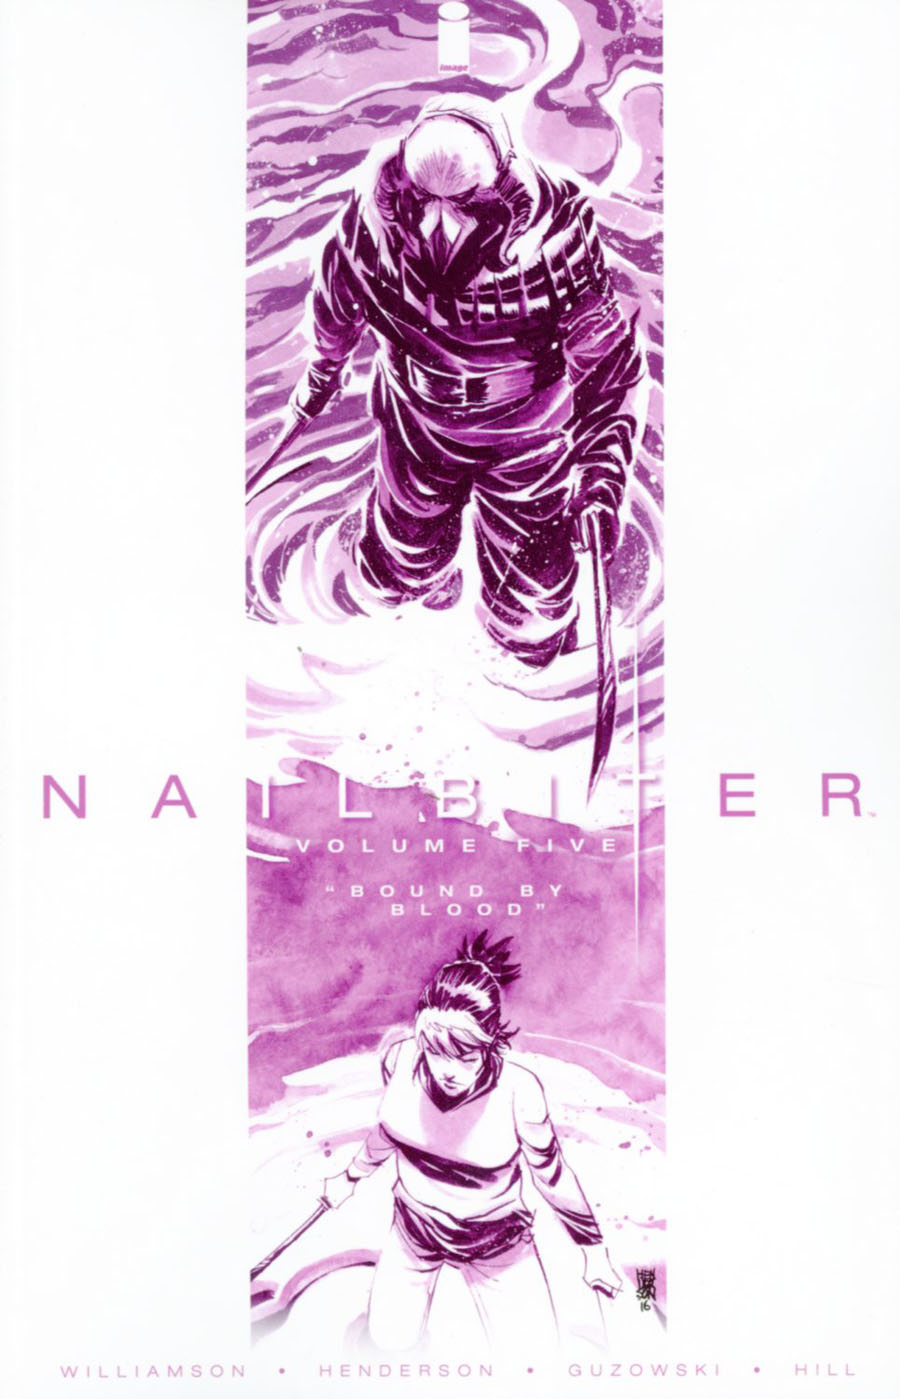 Nailbiter Vol 5 Bound By Blood TP